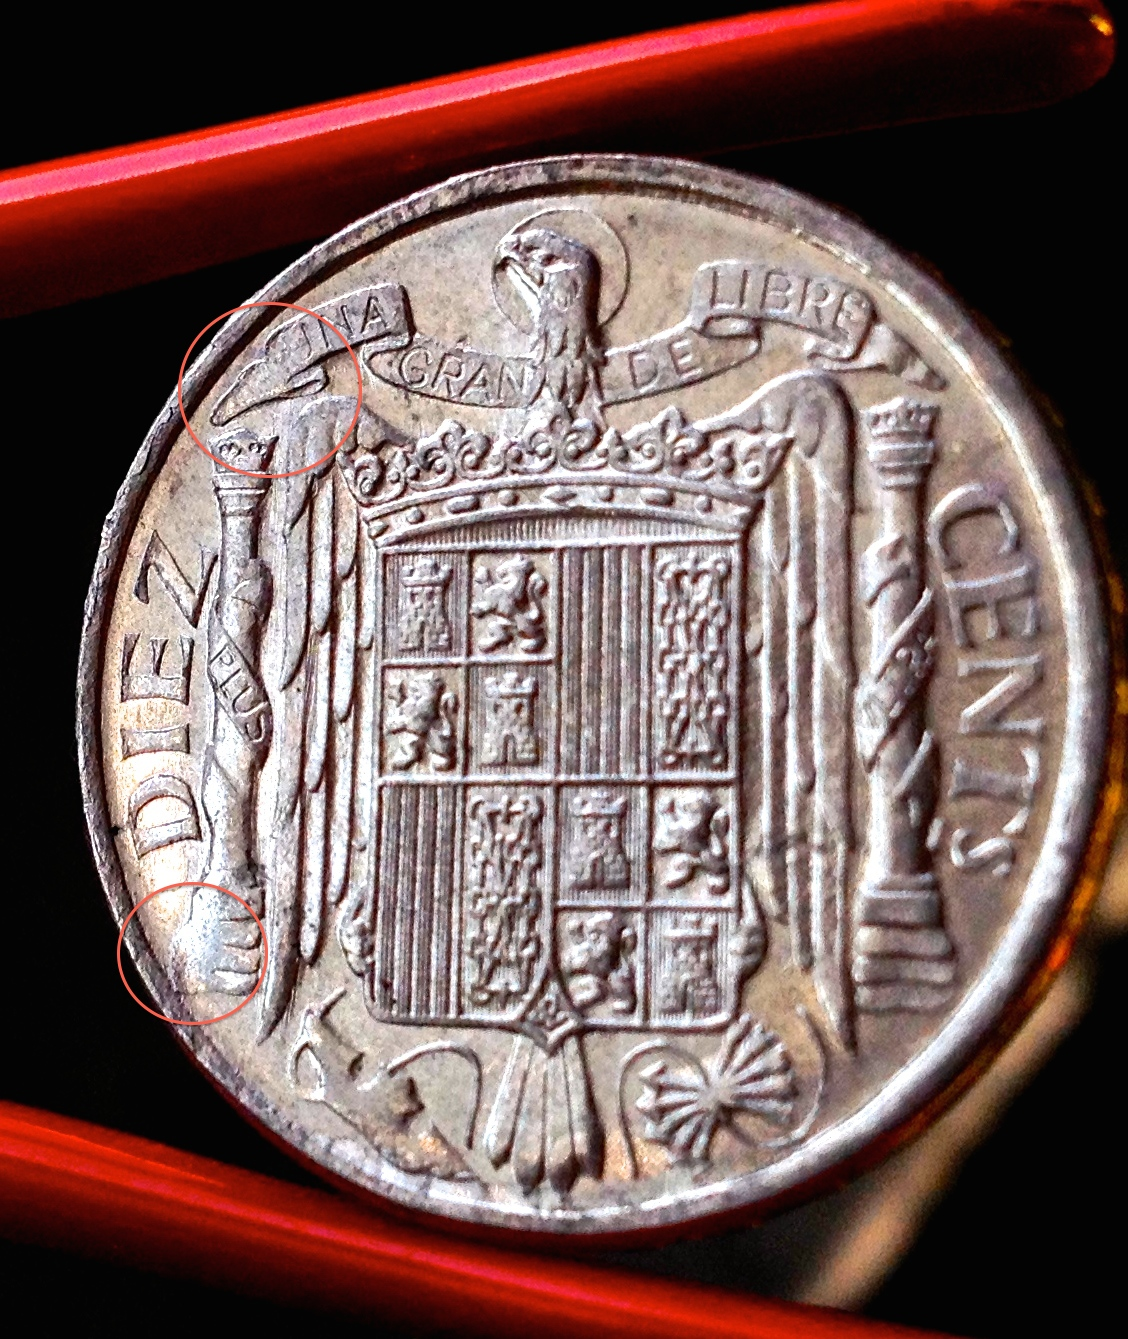 10 céntimos 1940 Estado Español IMG_4569